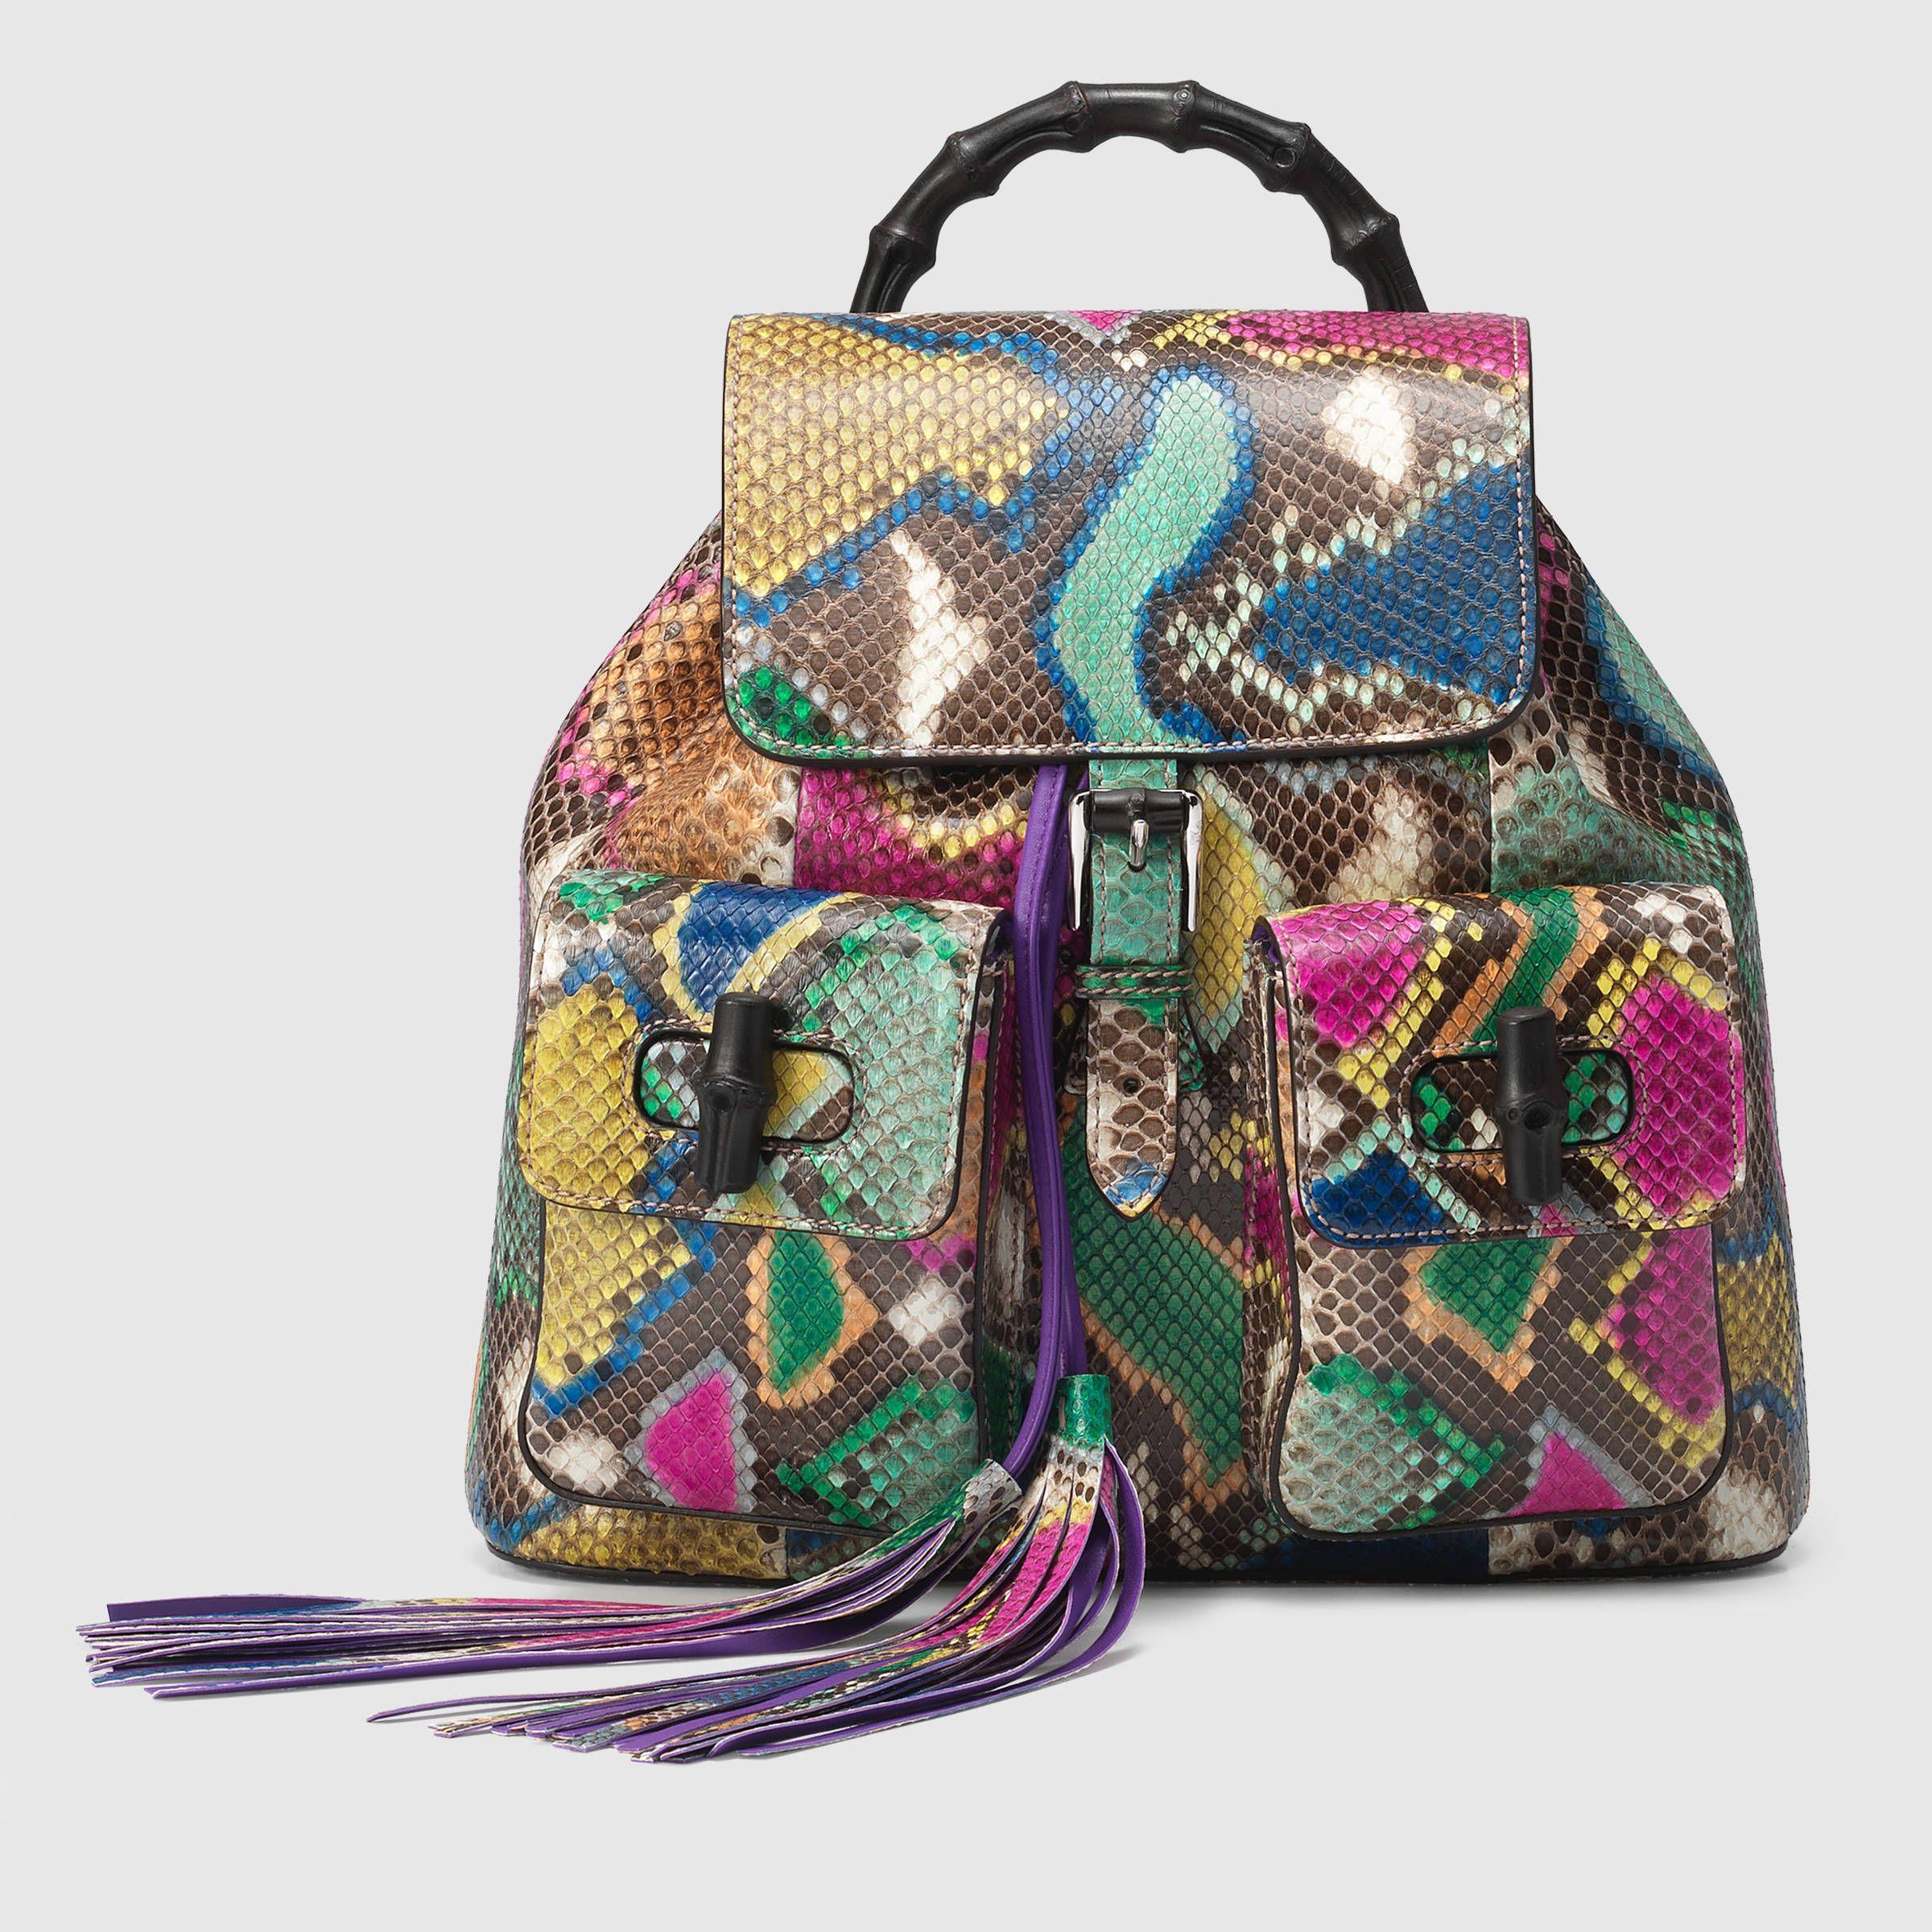 3a9eafd44ba1 Gucci Women - Bamboo python backpack - 370833EWZ2N9577 | purses ...